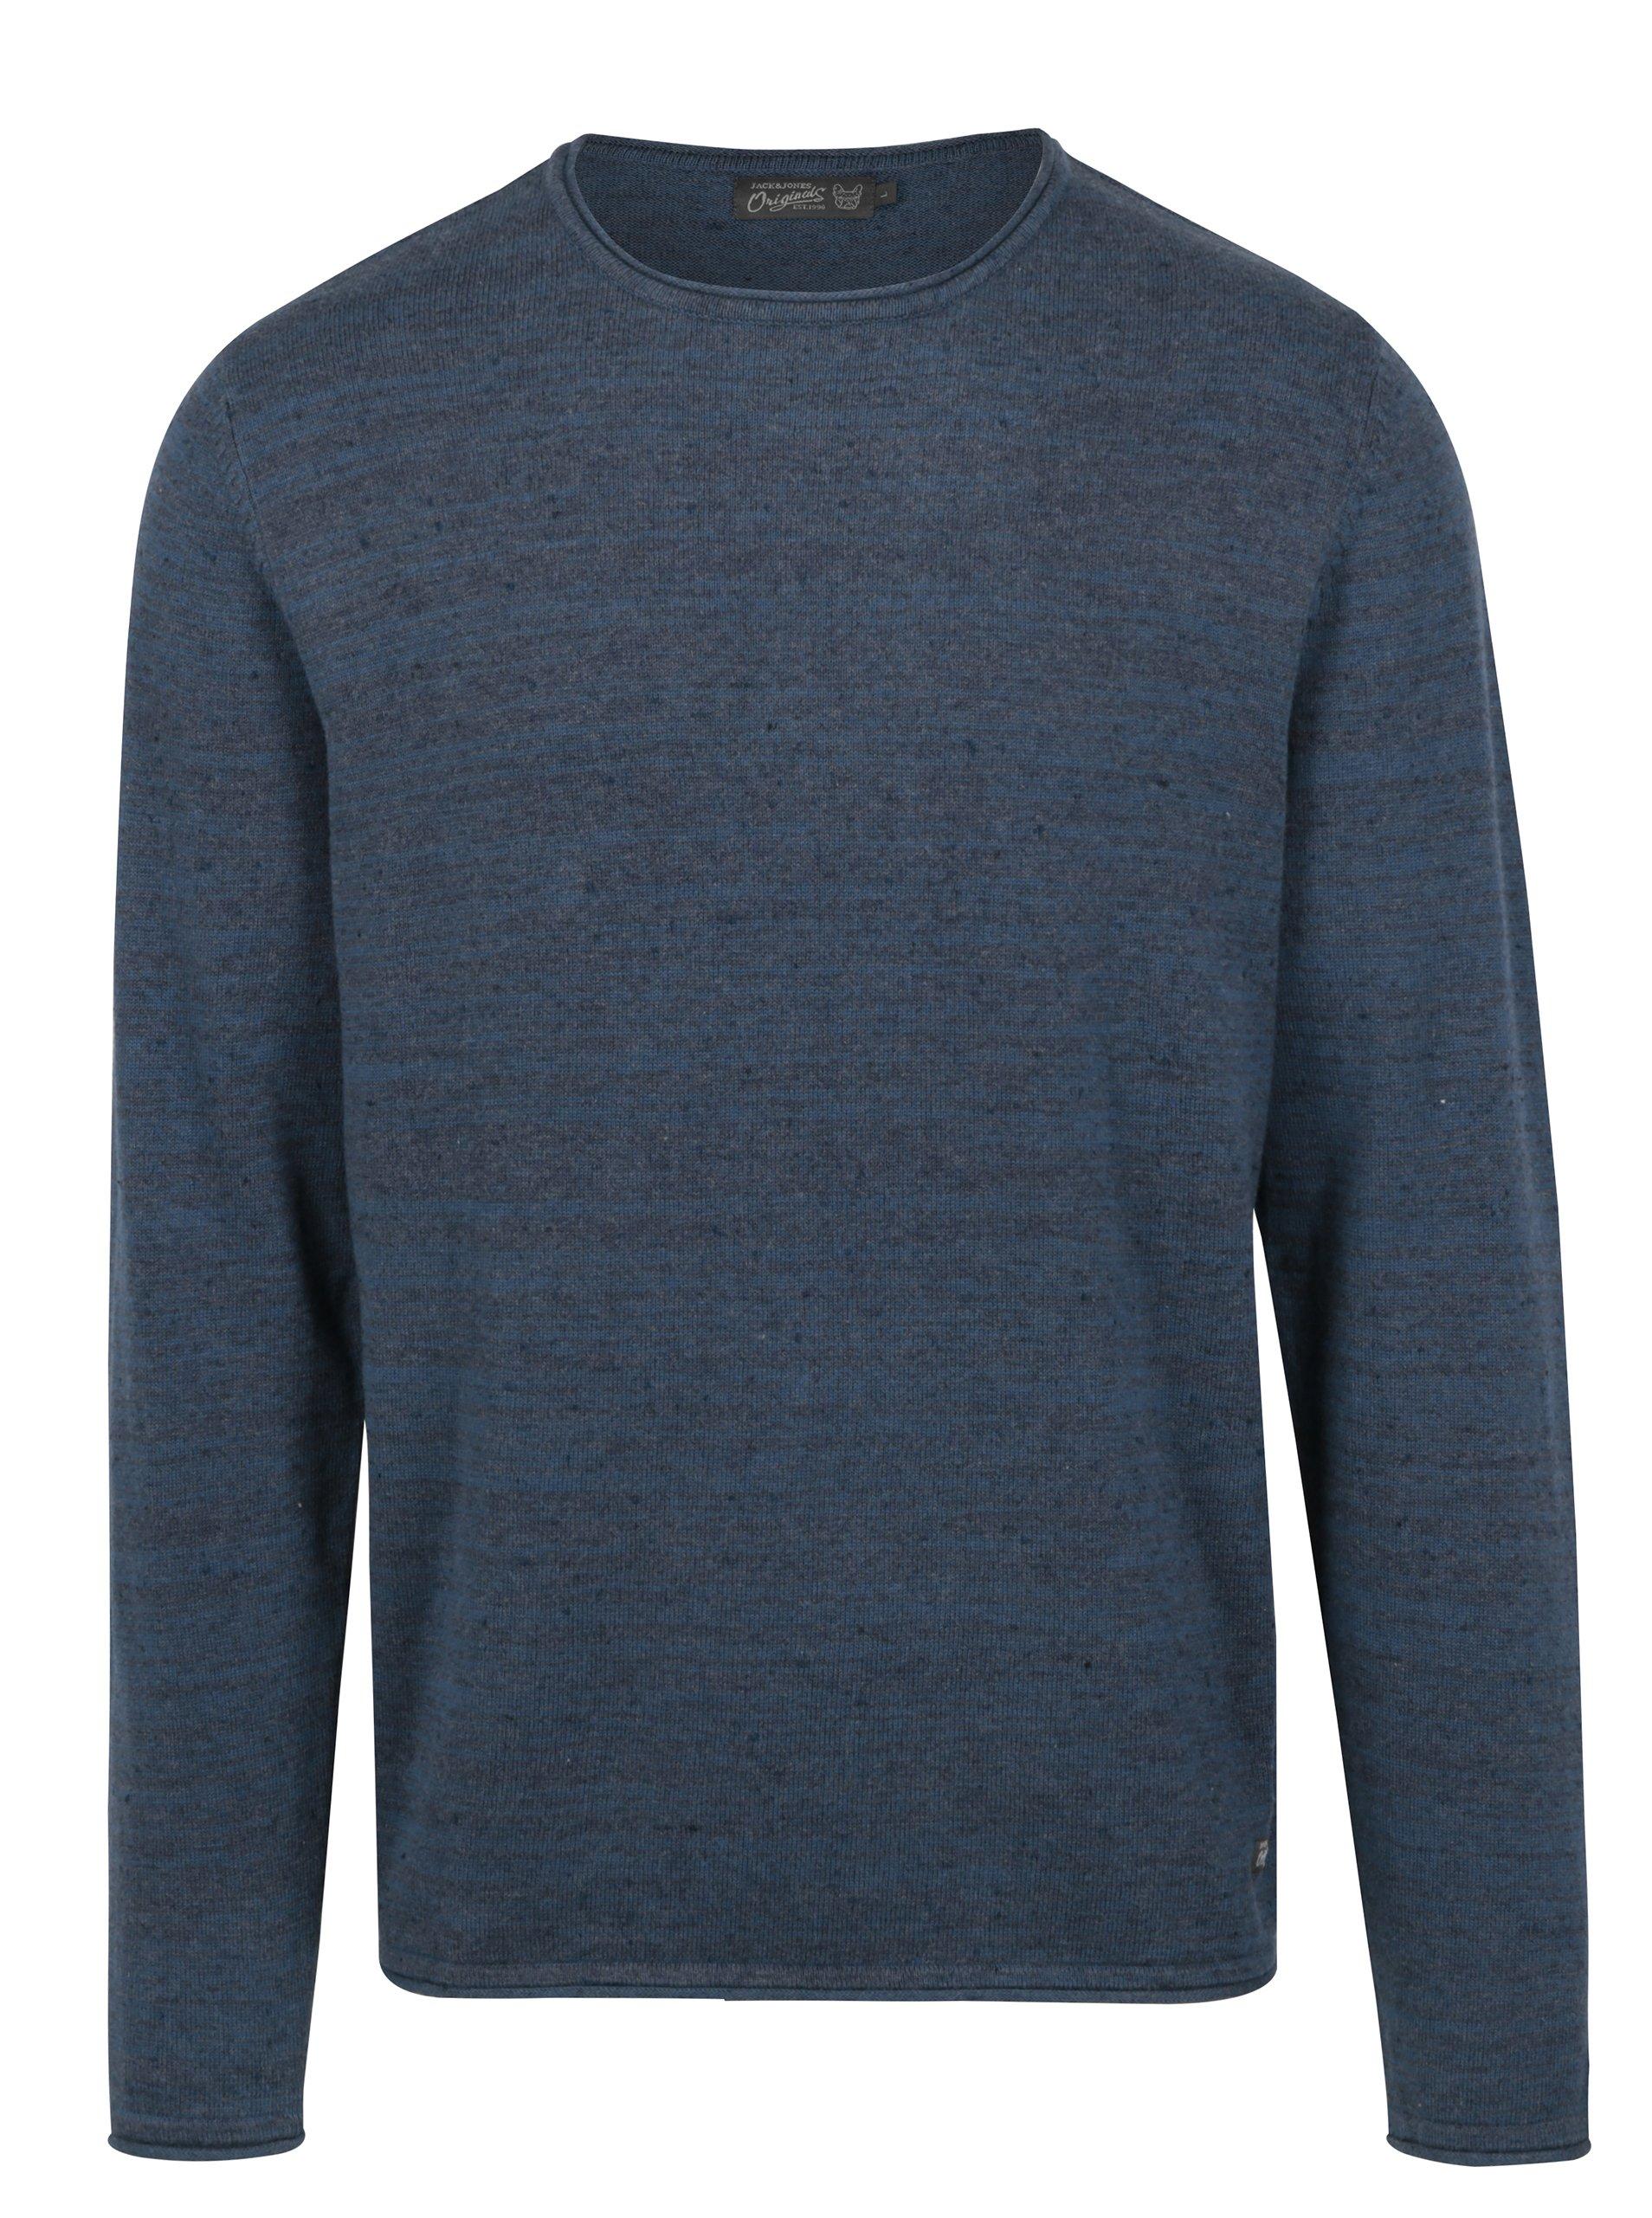 Modrý žíhaný svetr Jack & Jones Wills